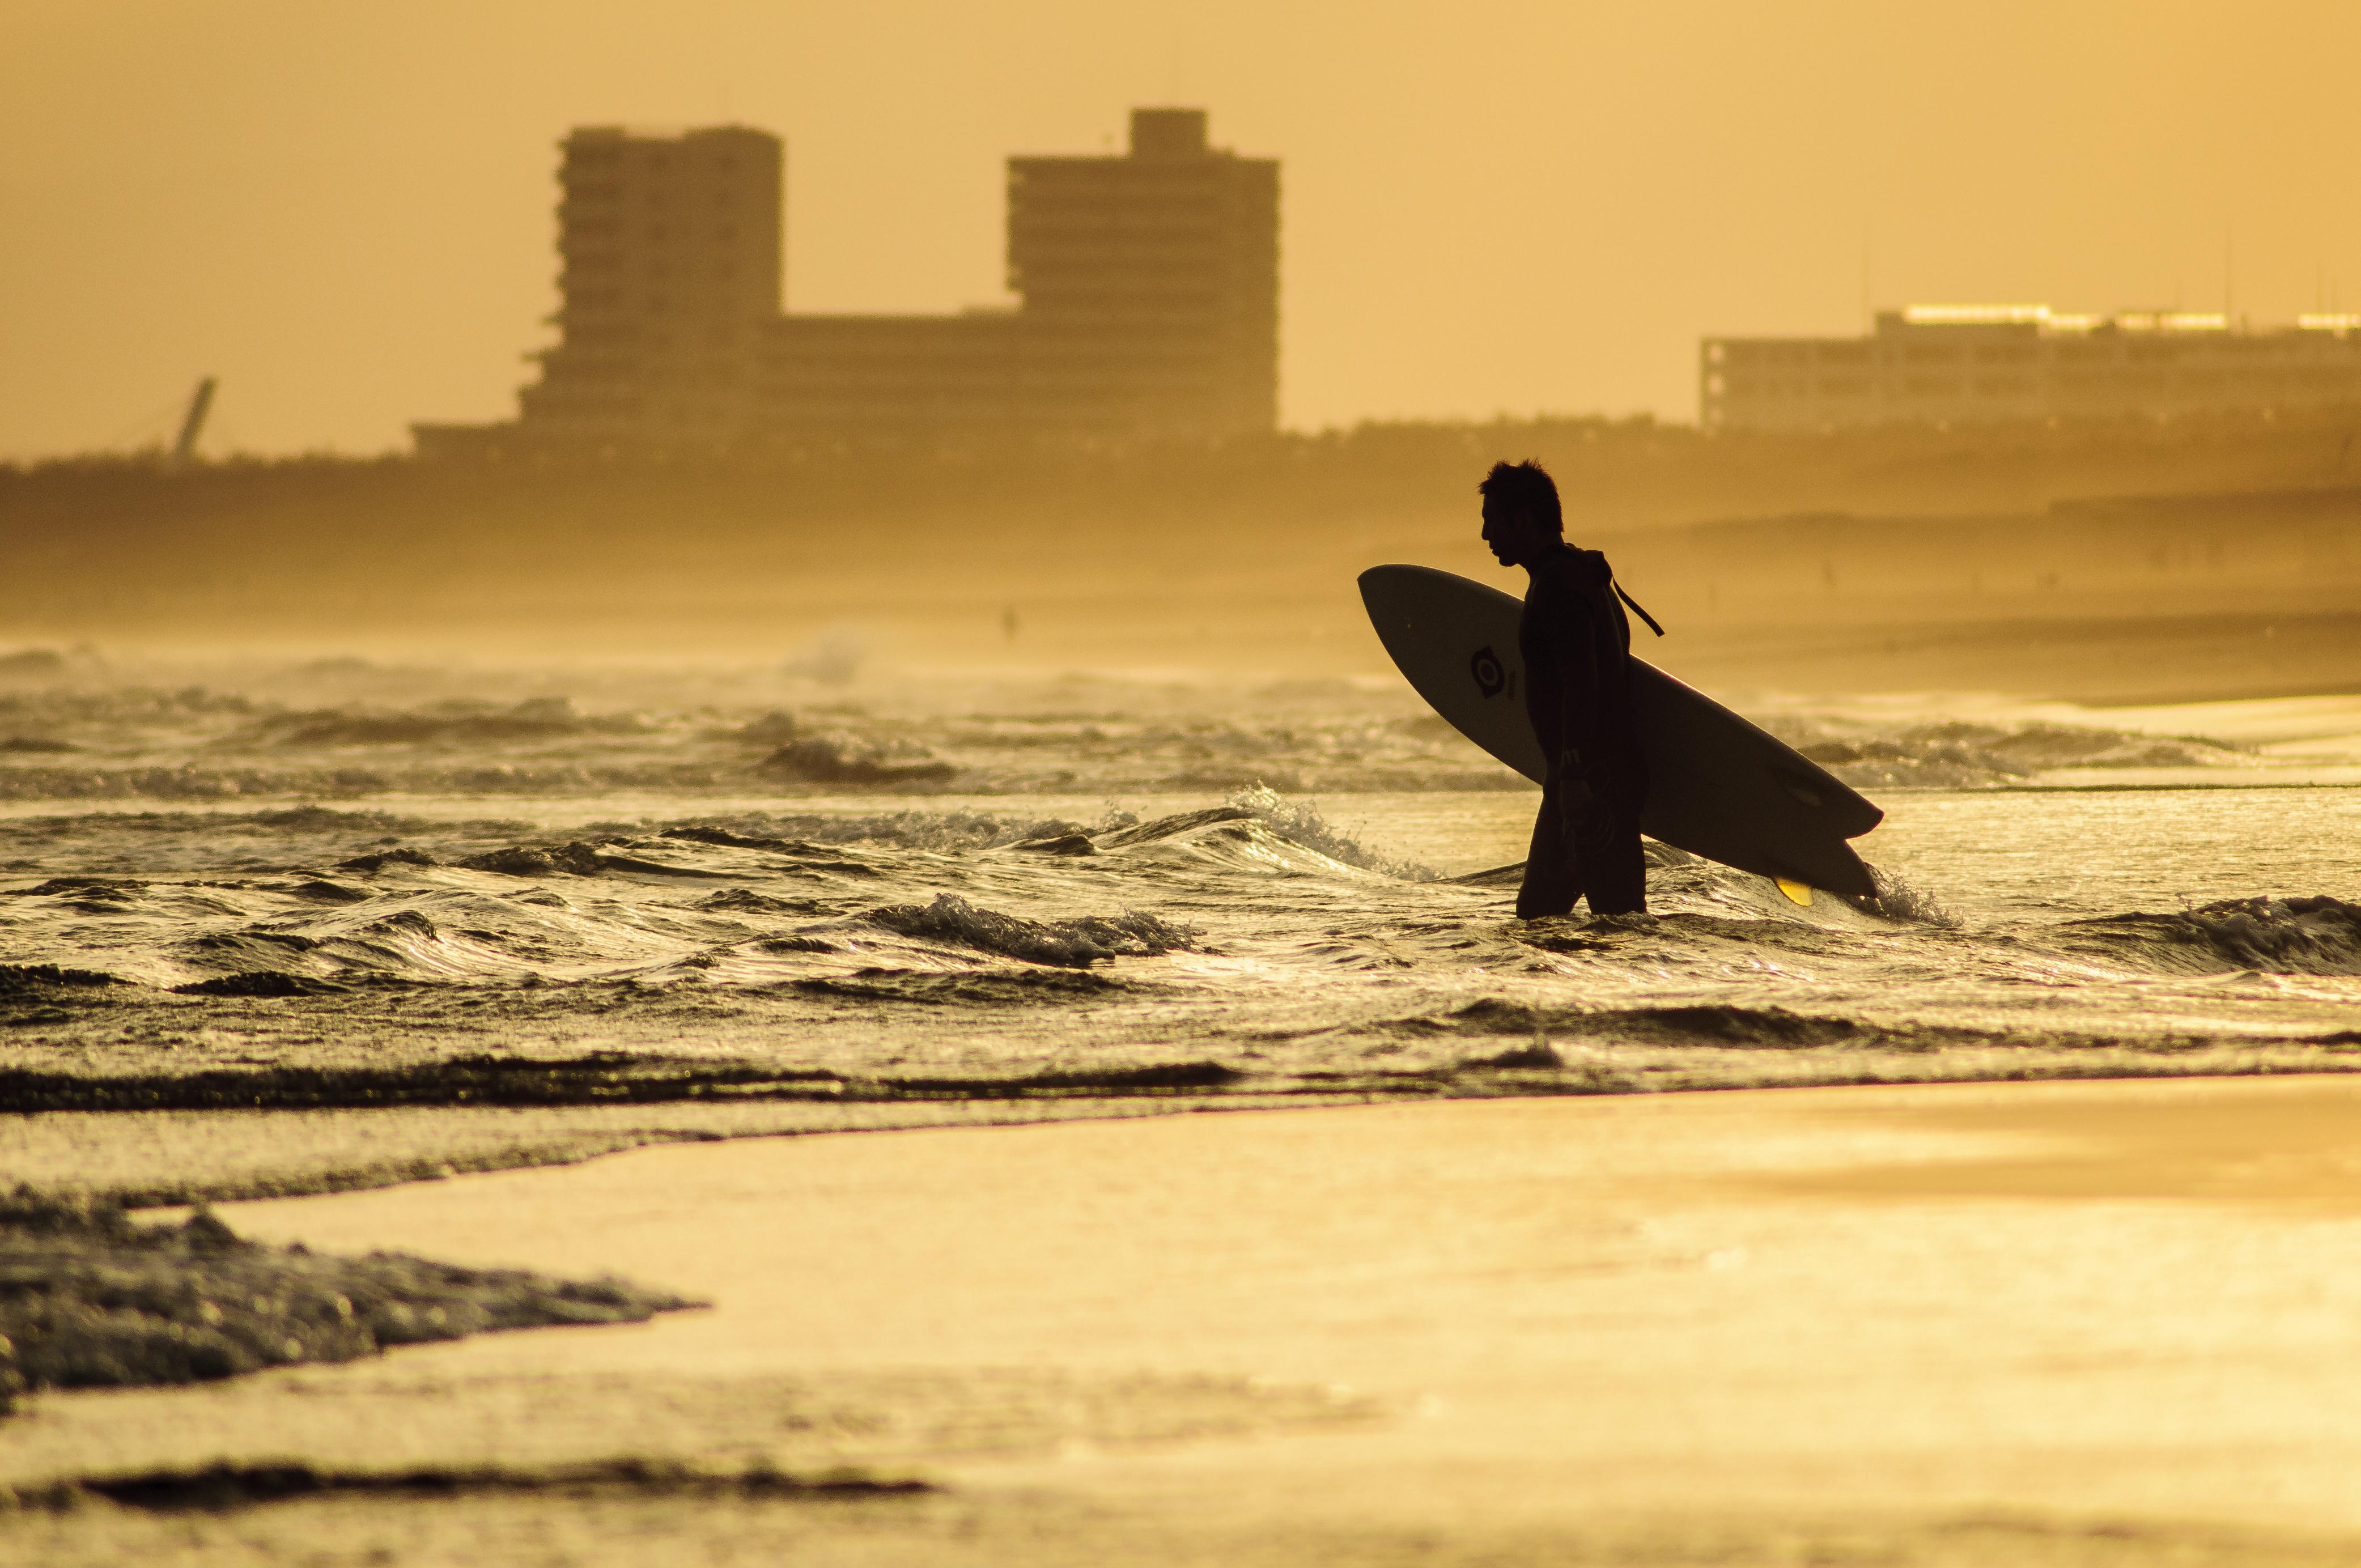 Wallpaper Sunlight Sunset Sea Shore Sand Silhouette